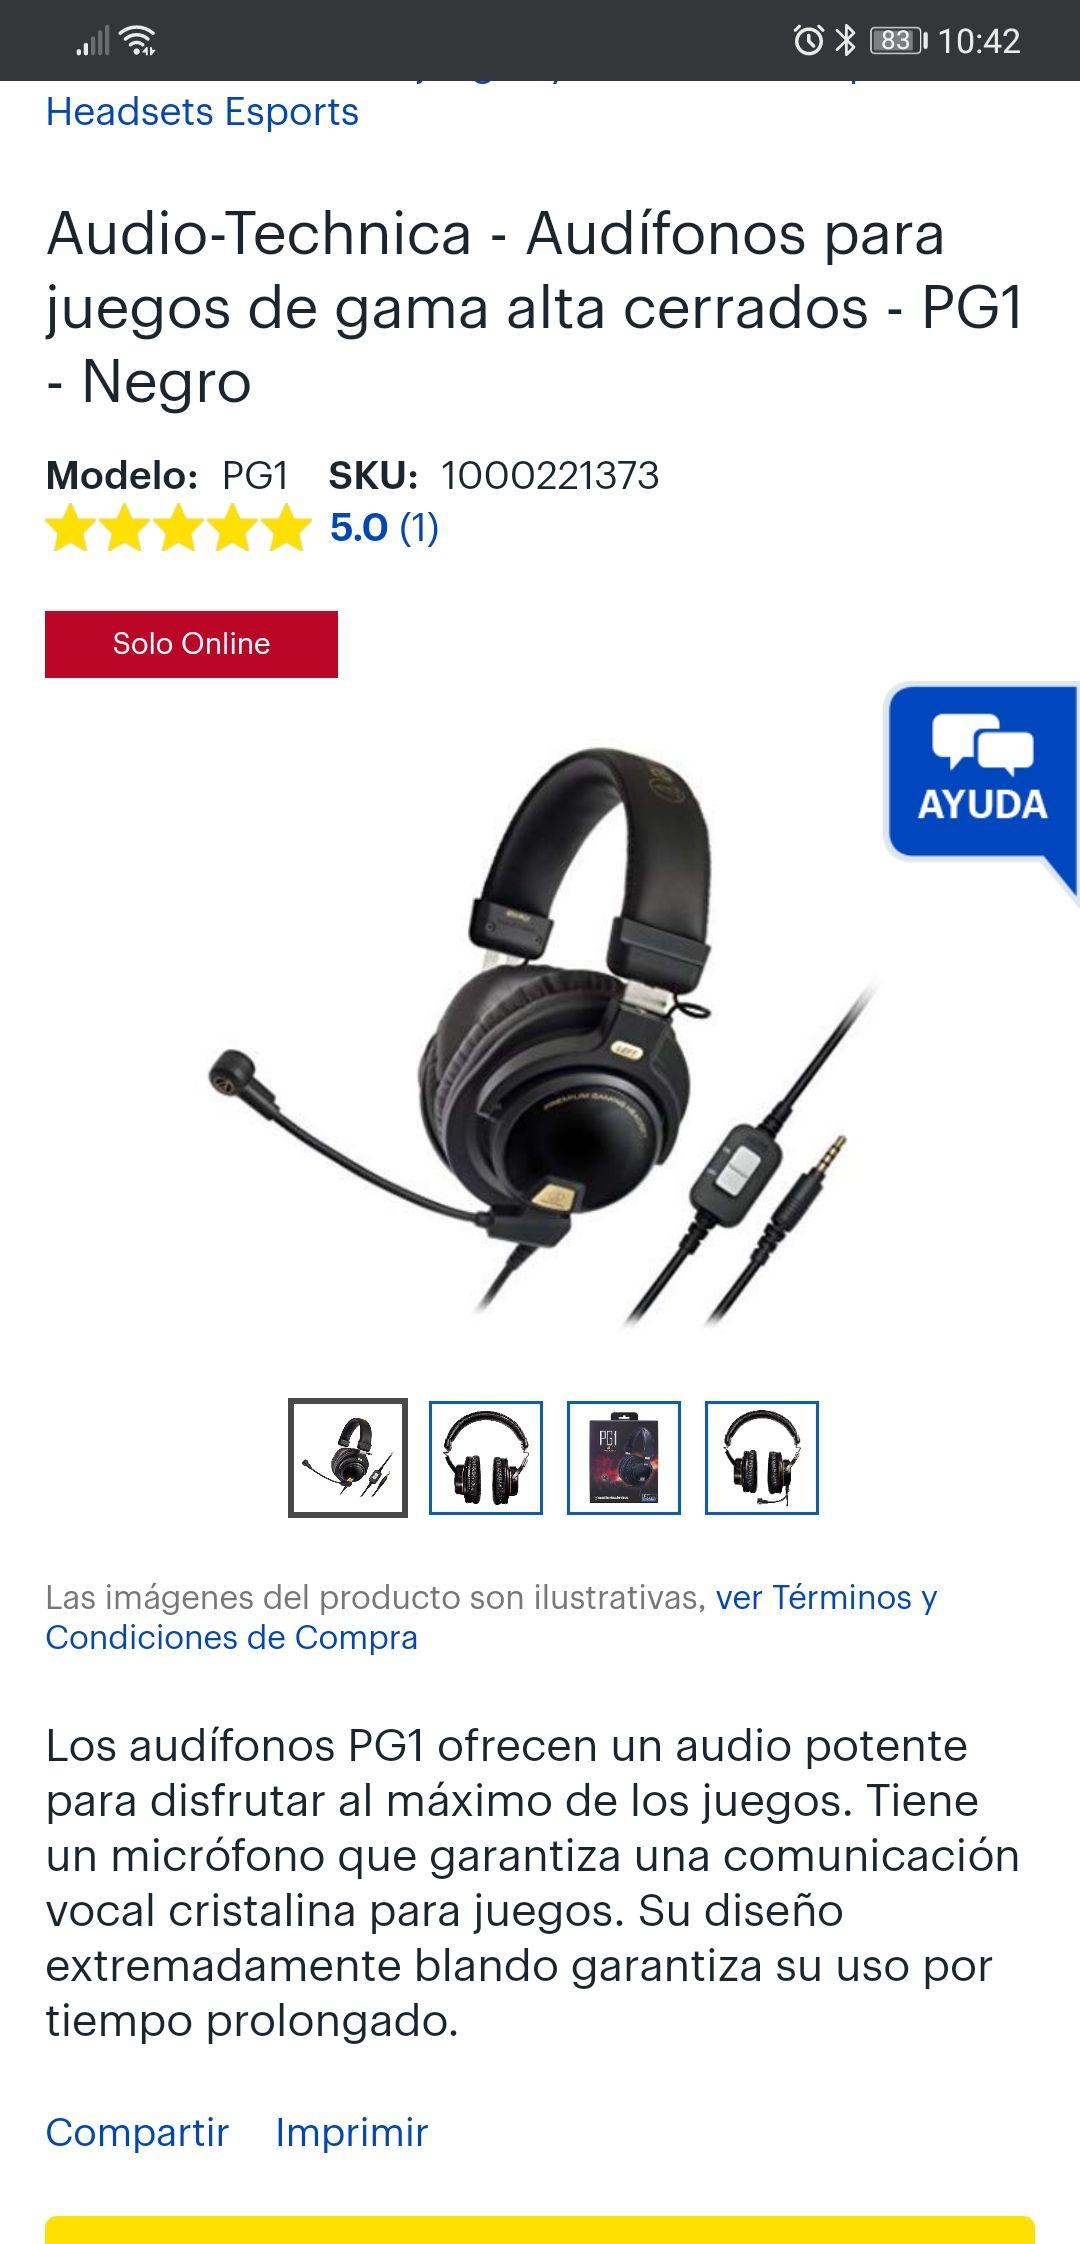 Best Buy: Audifonos Audio Technica pg1 gaming